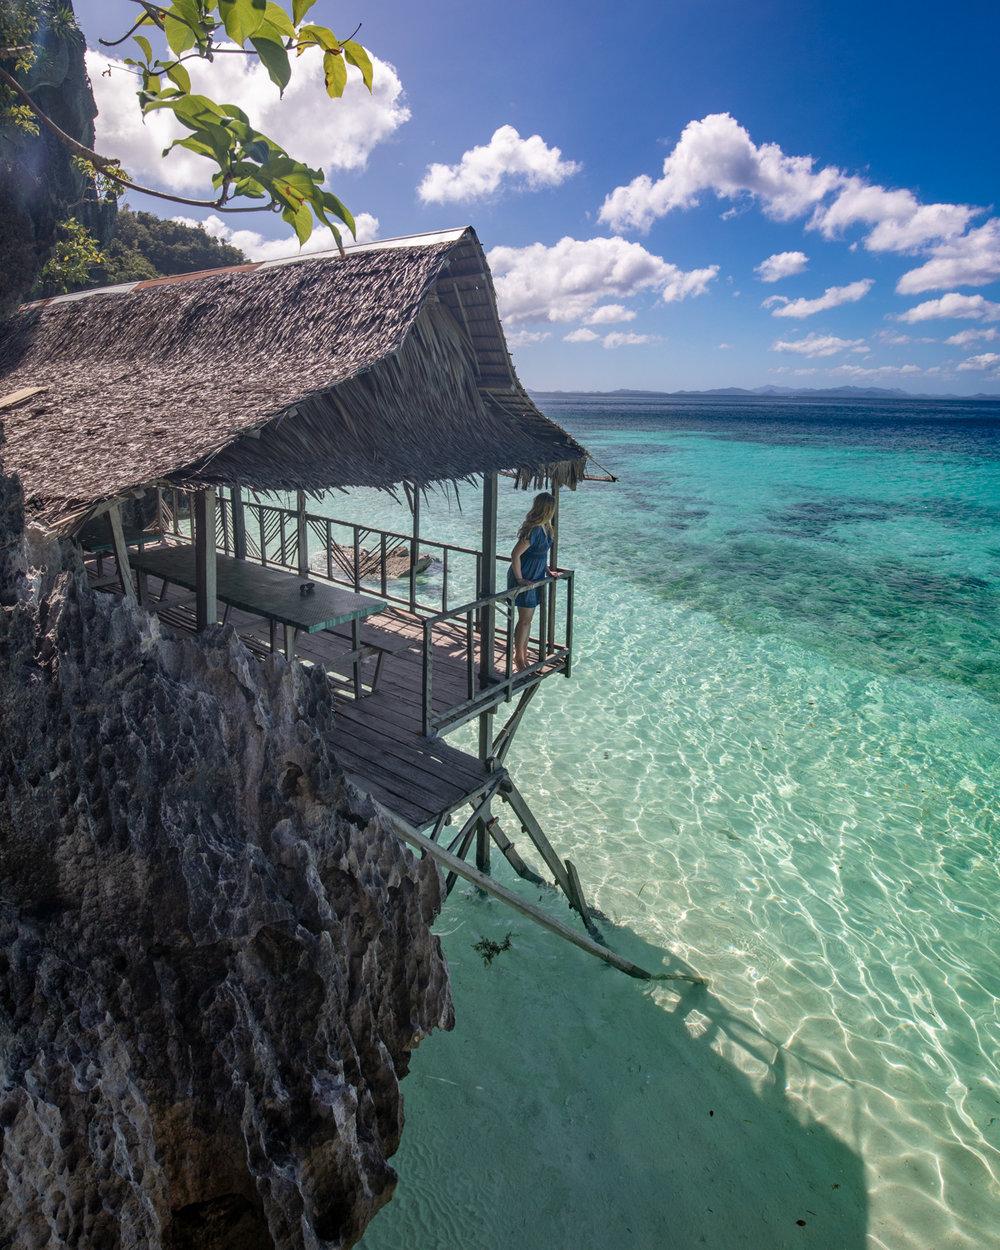 Banul Beach, Coron Palawan